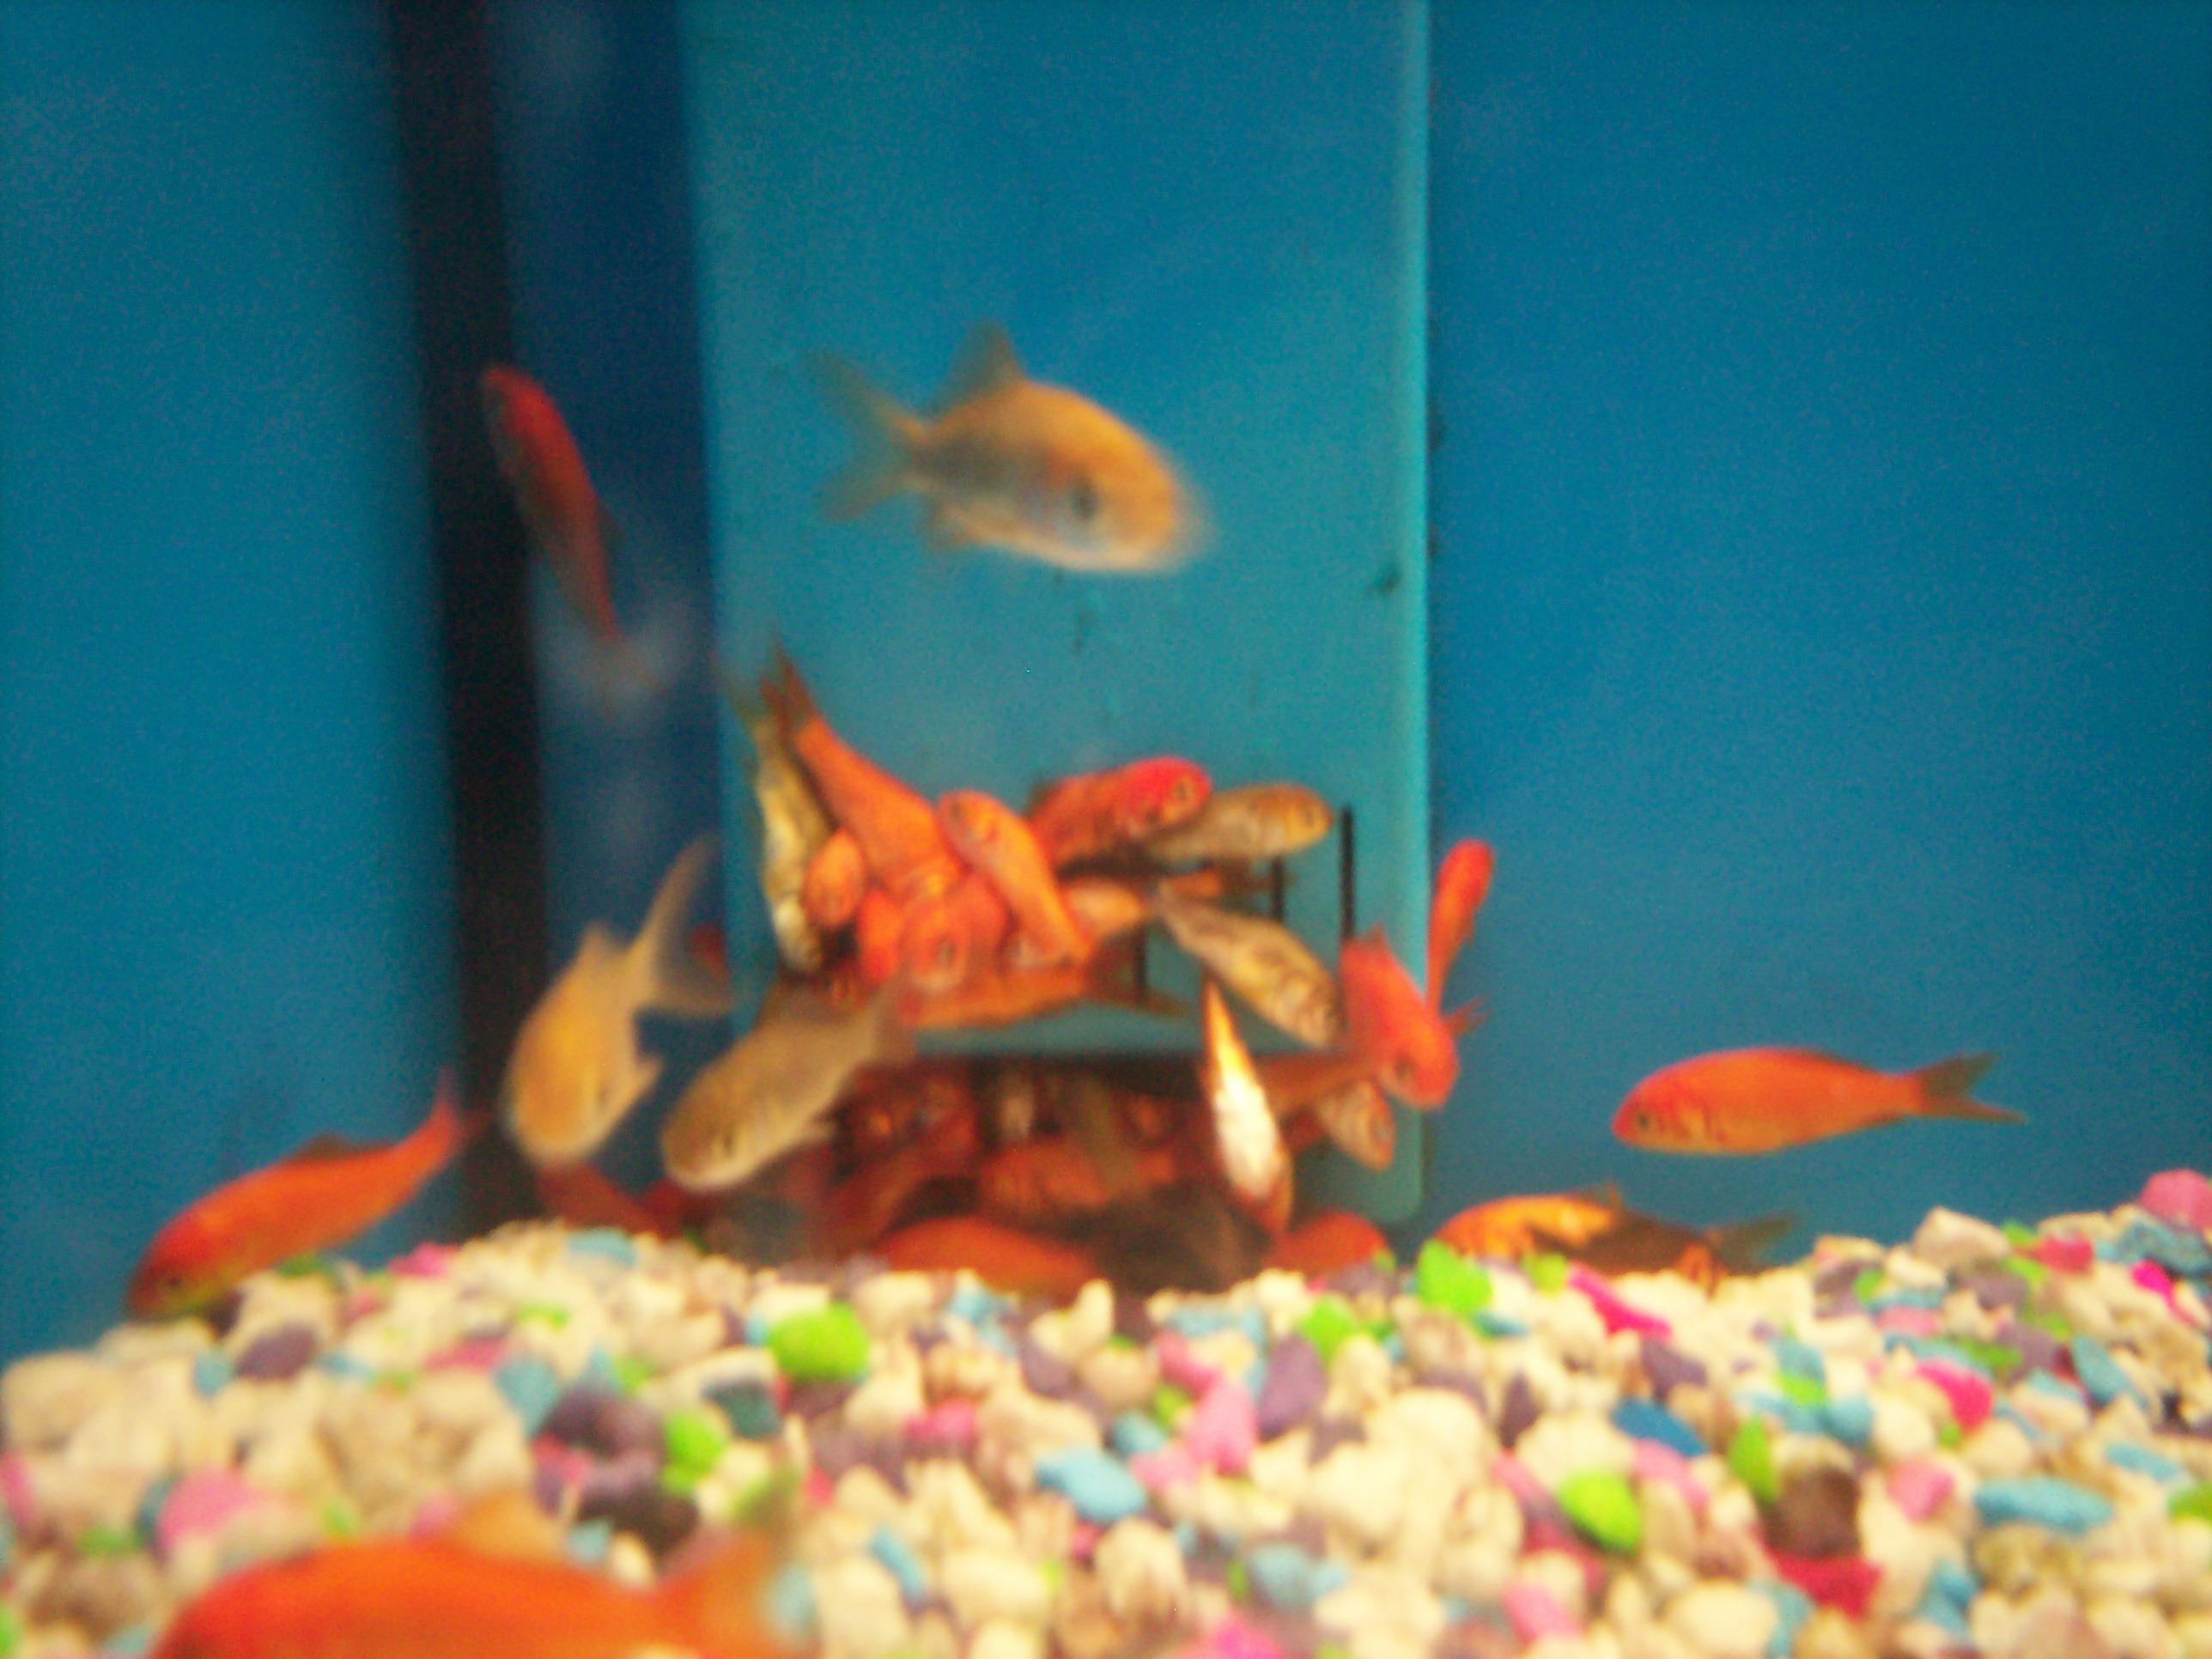 Dead fish at walmart 3 by jamielynneaiken on deviantart for Fish at walmart